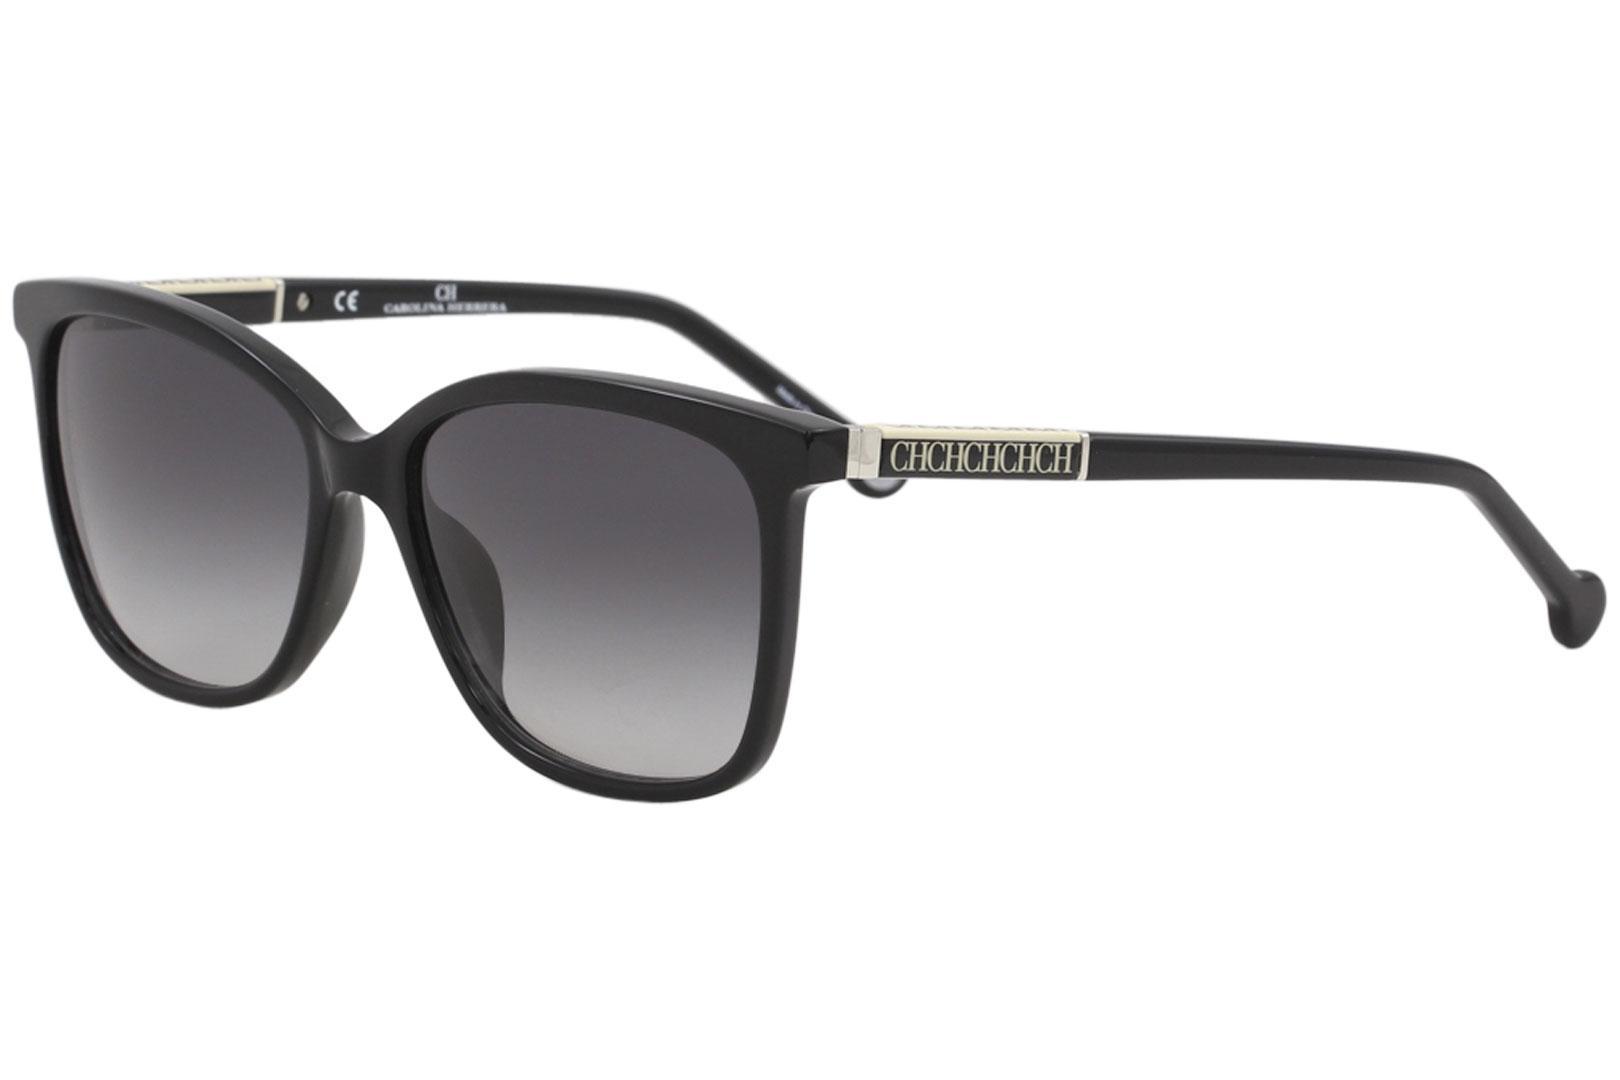 3698745dd8 CH Carolina Herrera Women s SHE702 SHE 702 Fashion Square Sunglasses by Carolina  Herrera